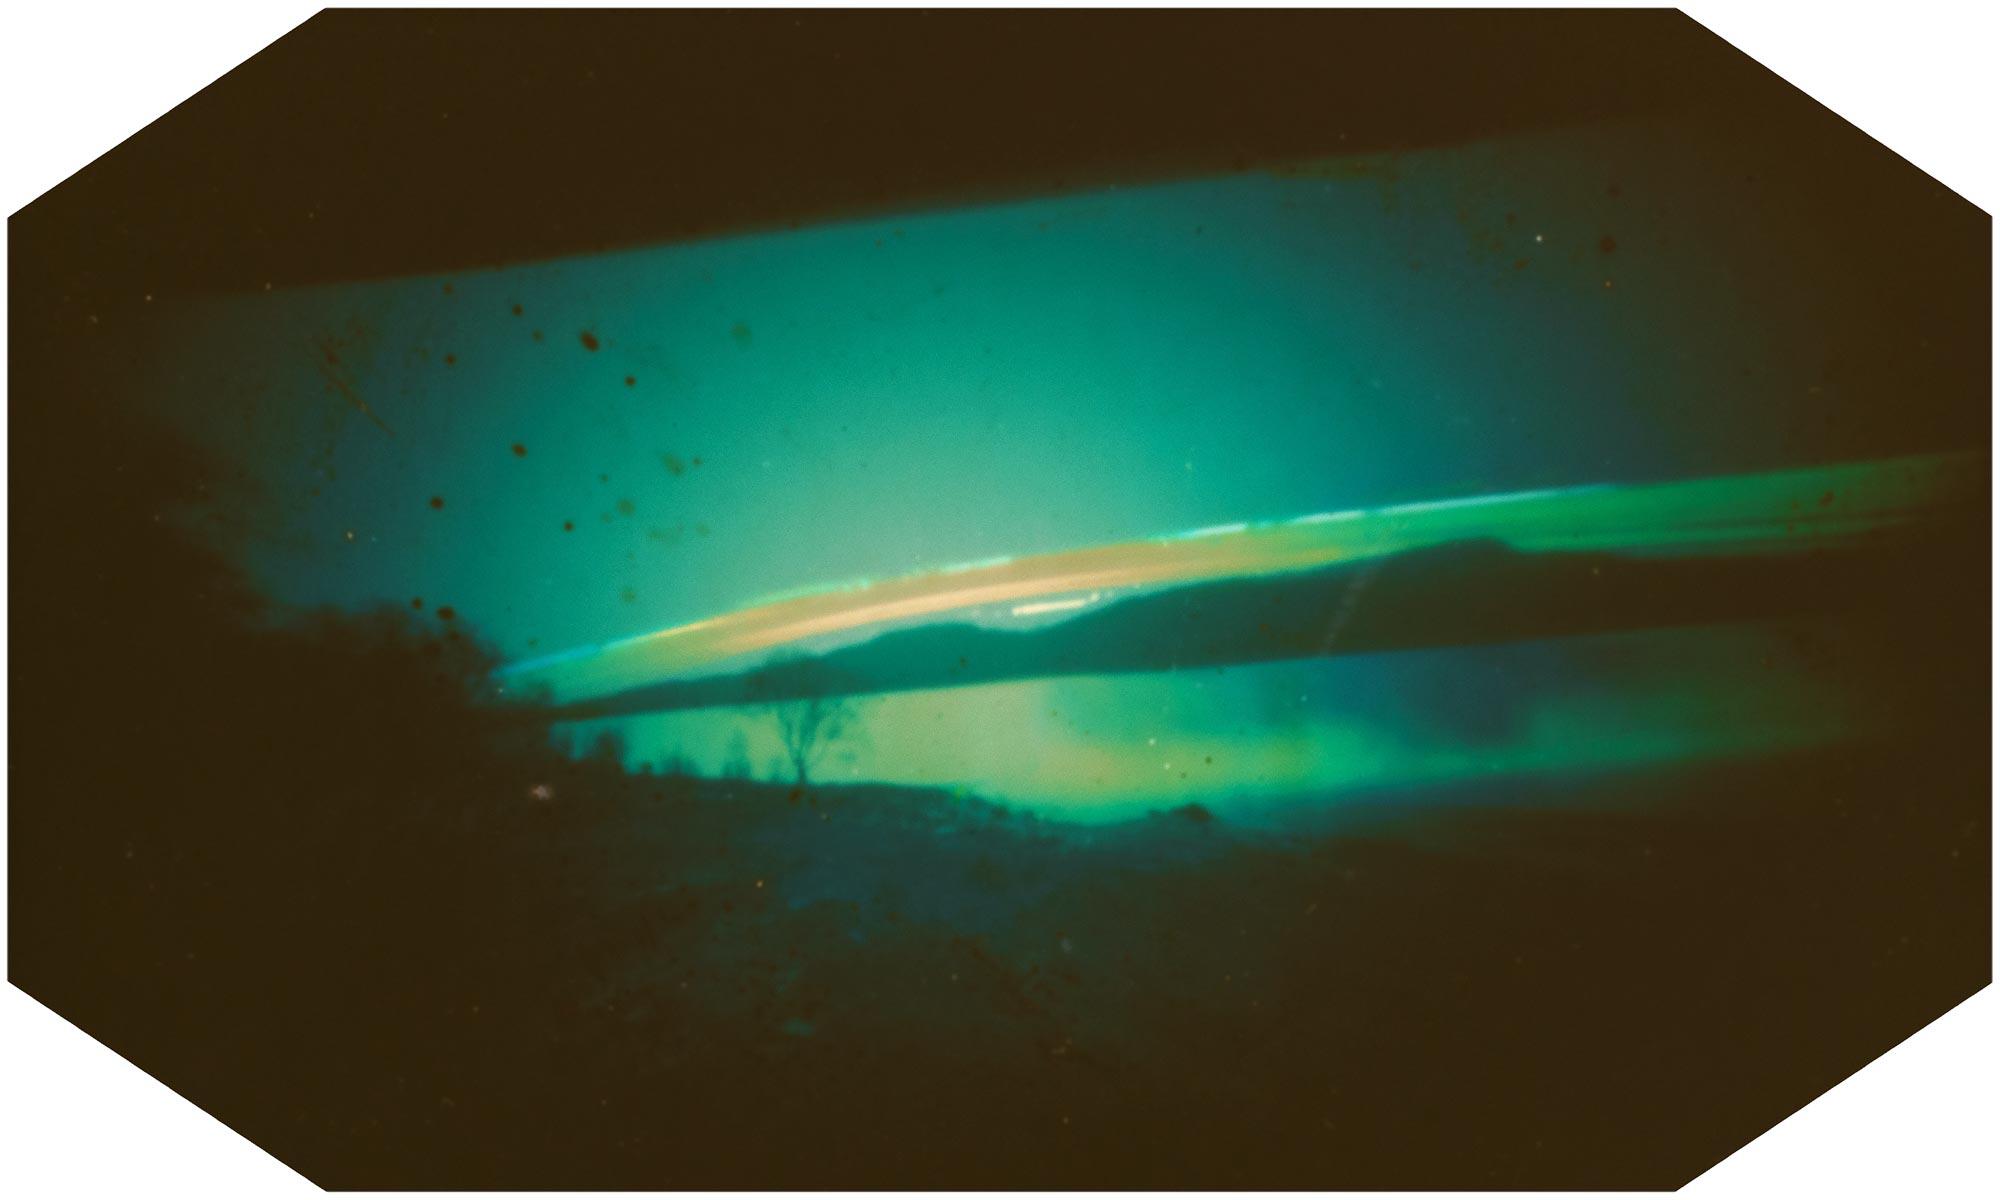 pinhole-solargraphy-photography-Morgans-Skip-kunstwerk-Calle-Ornemark-Norway